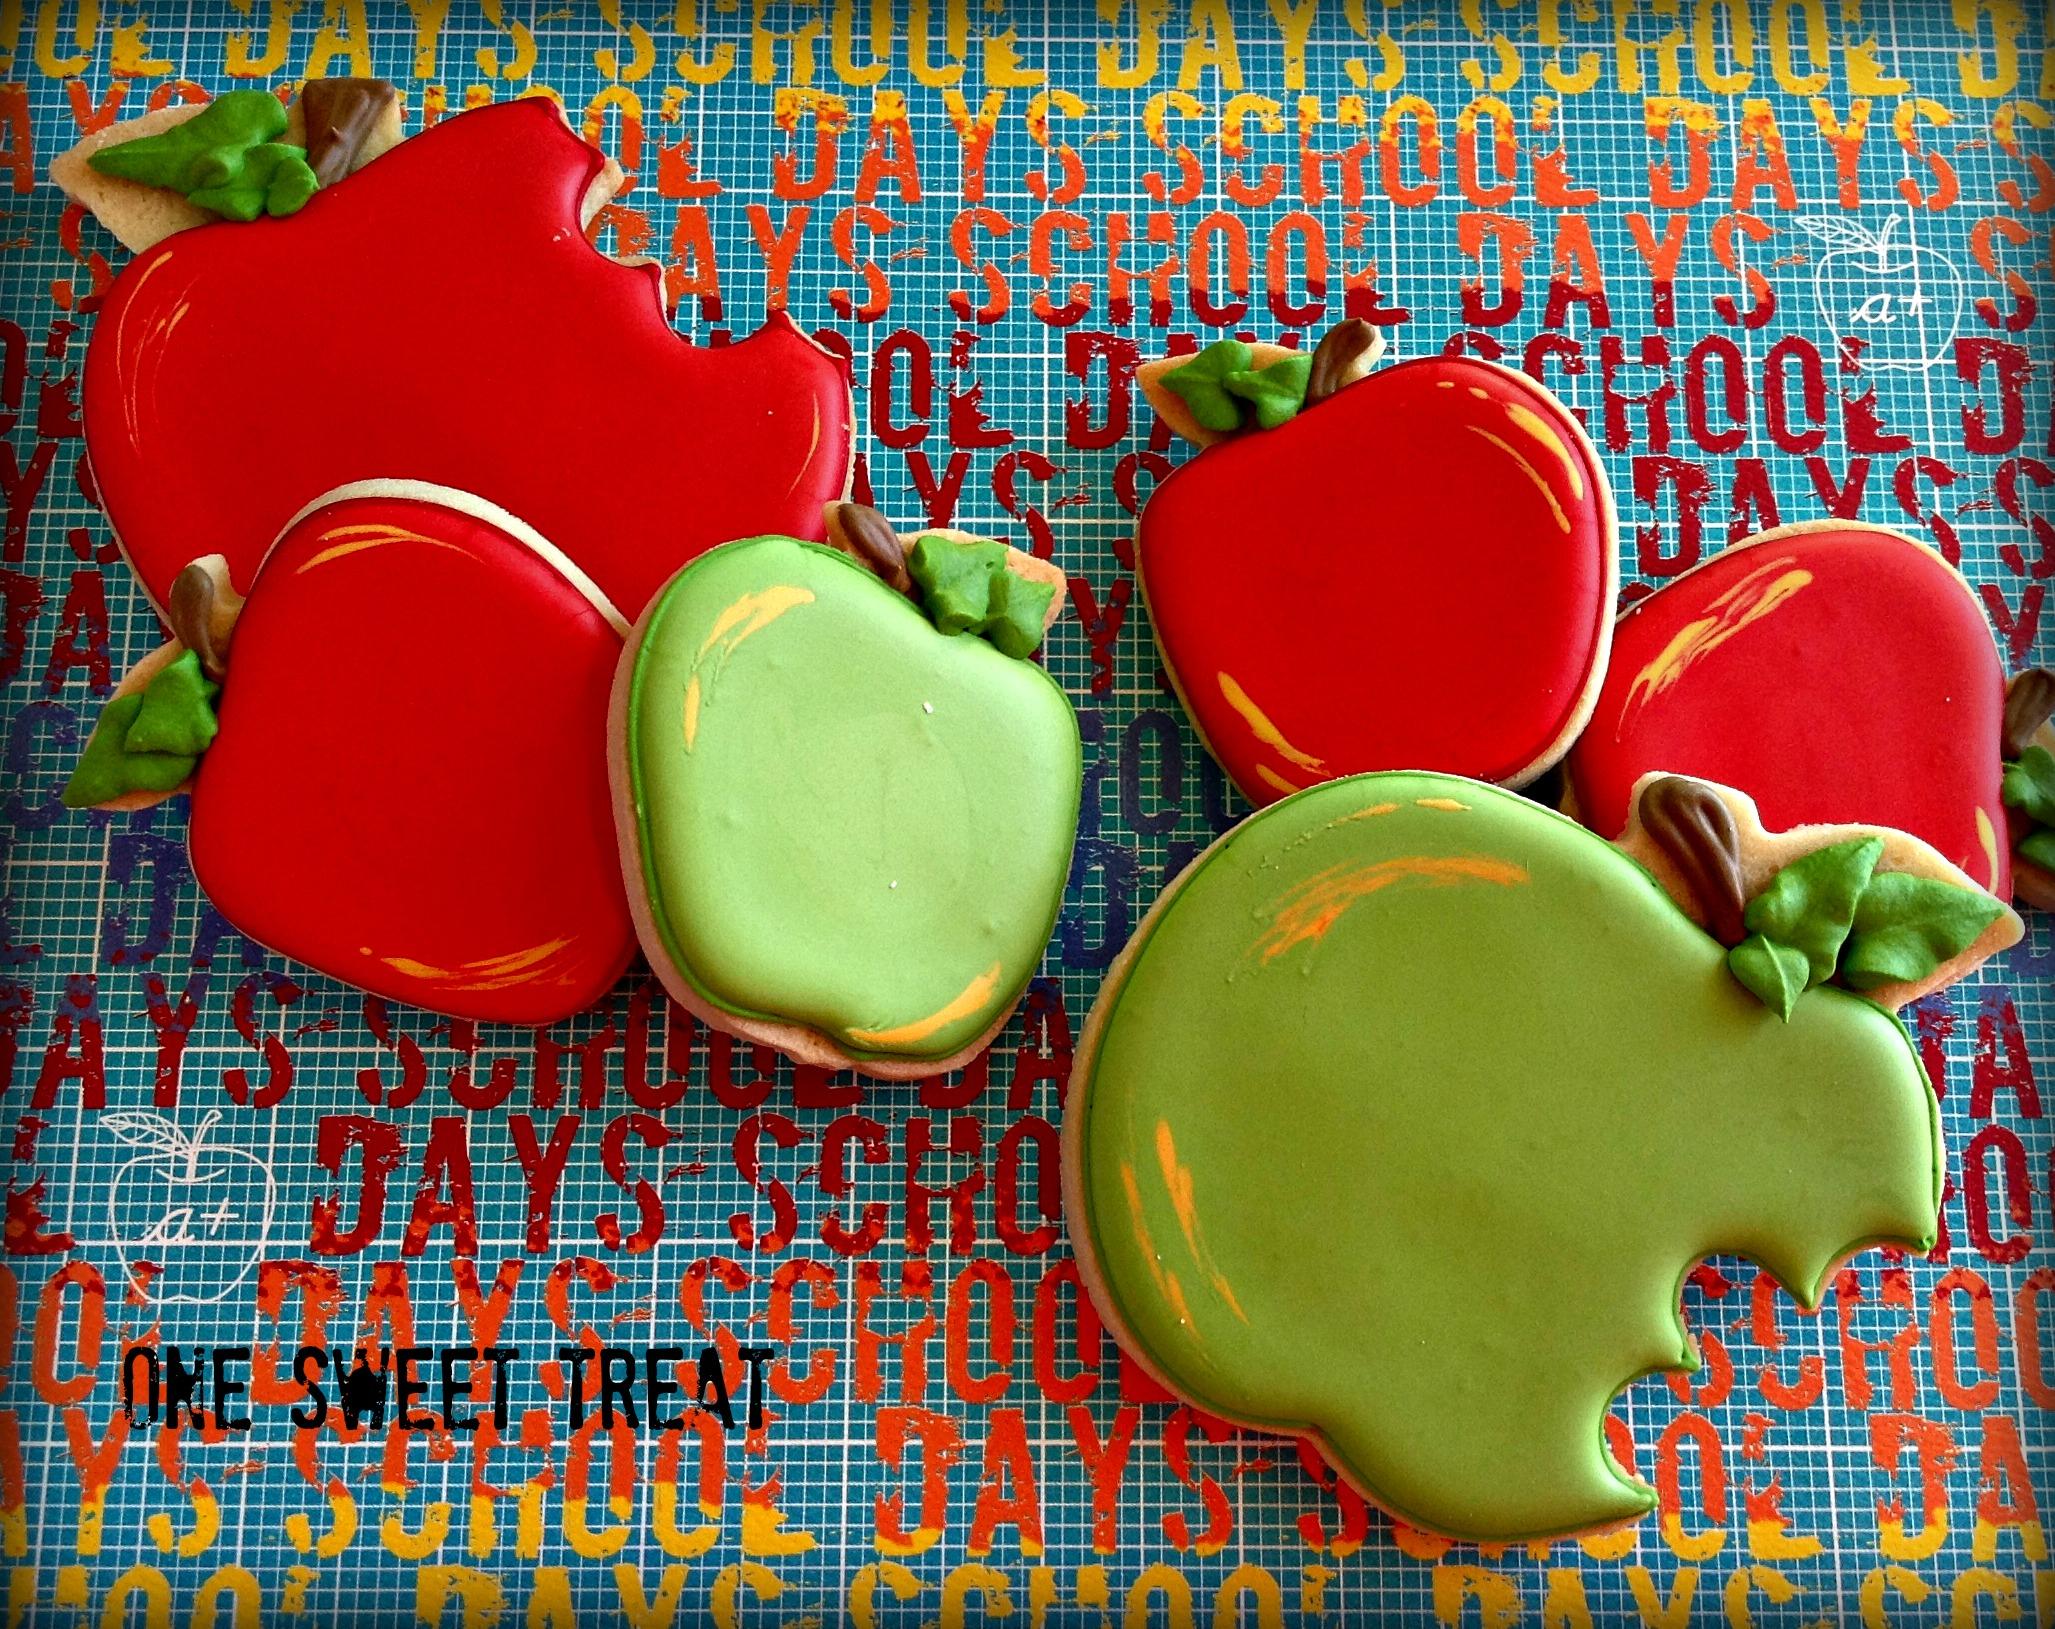 apples-img_5155